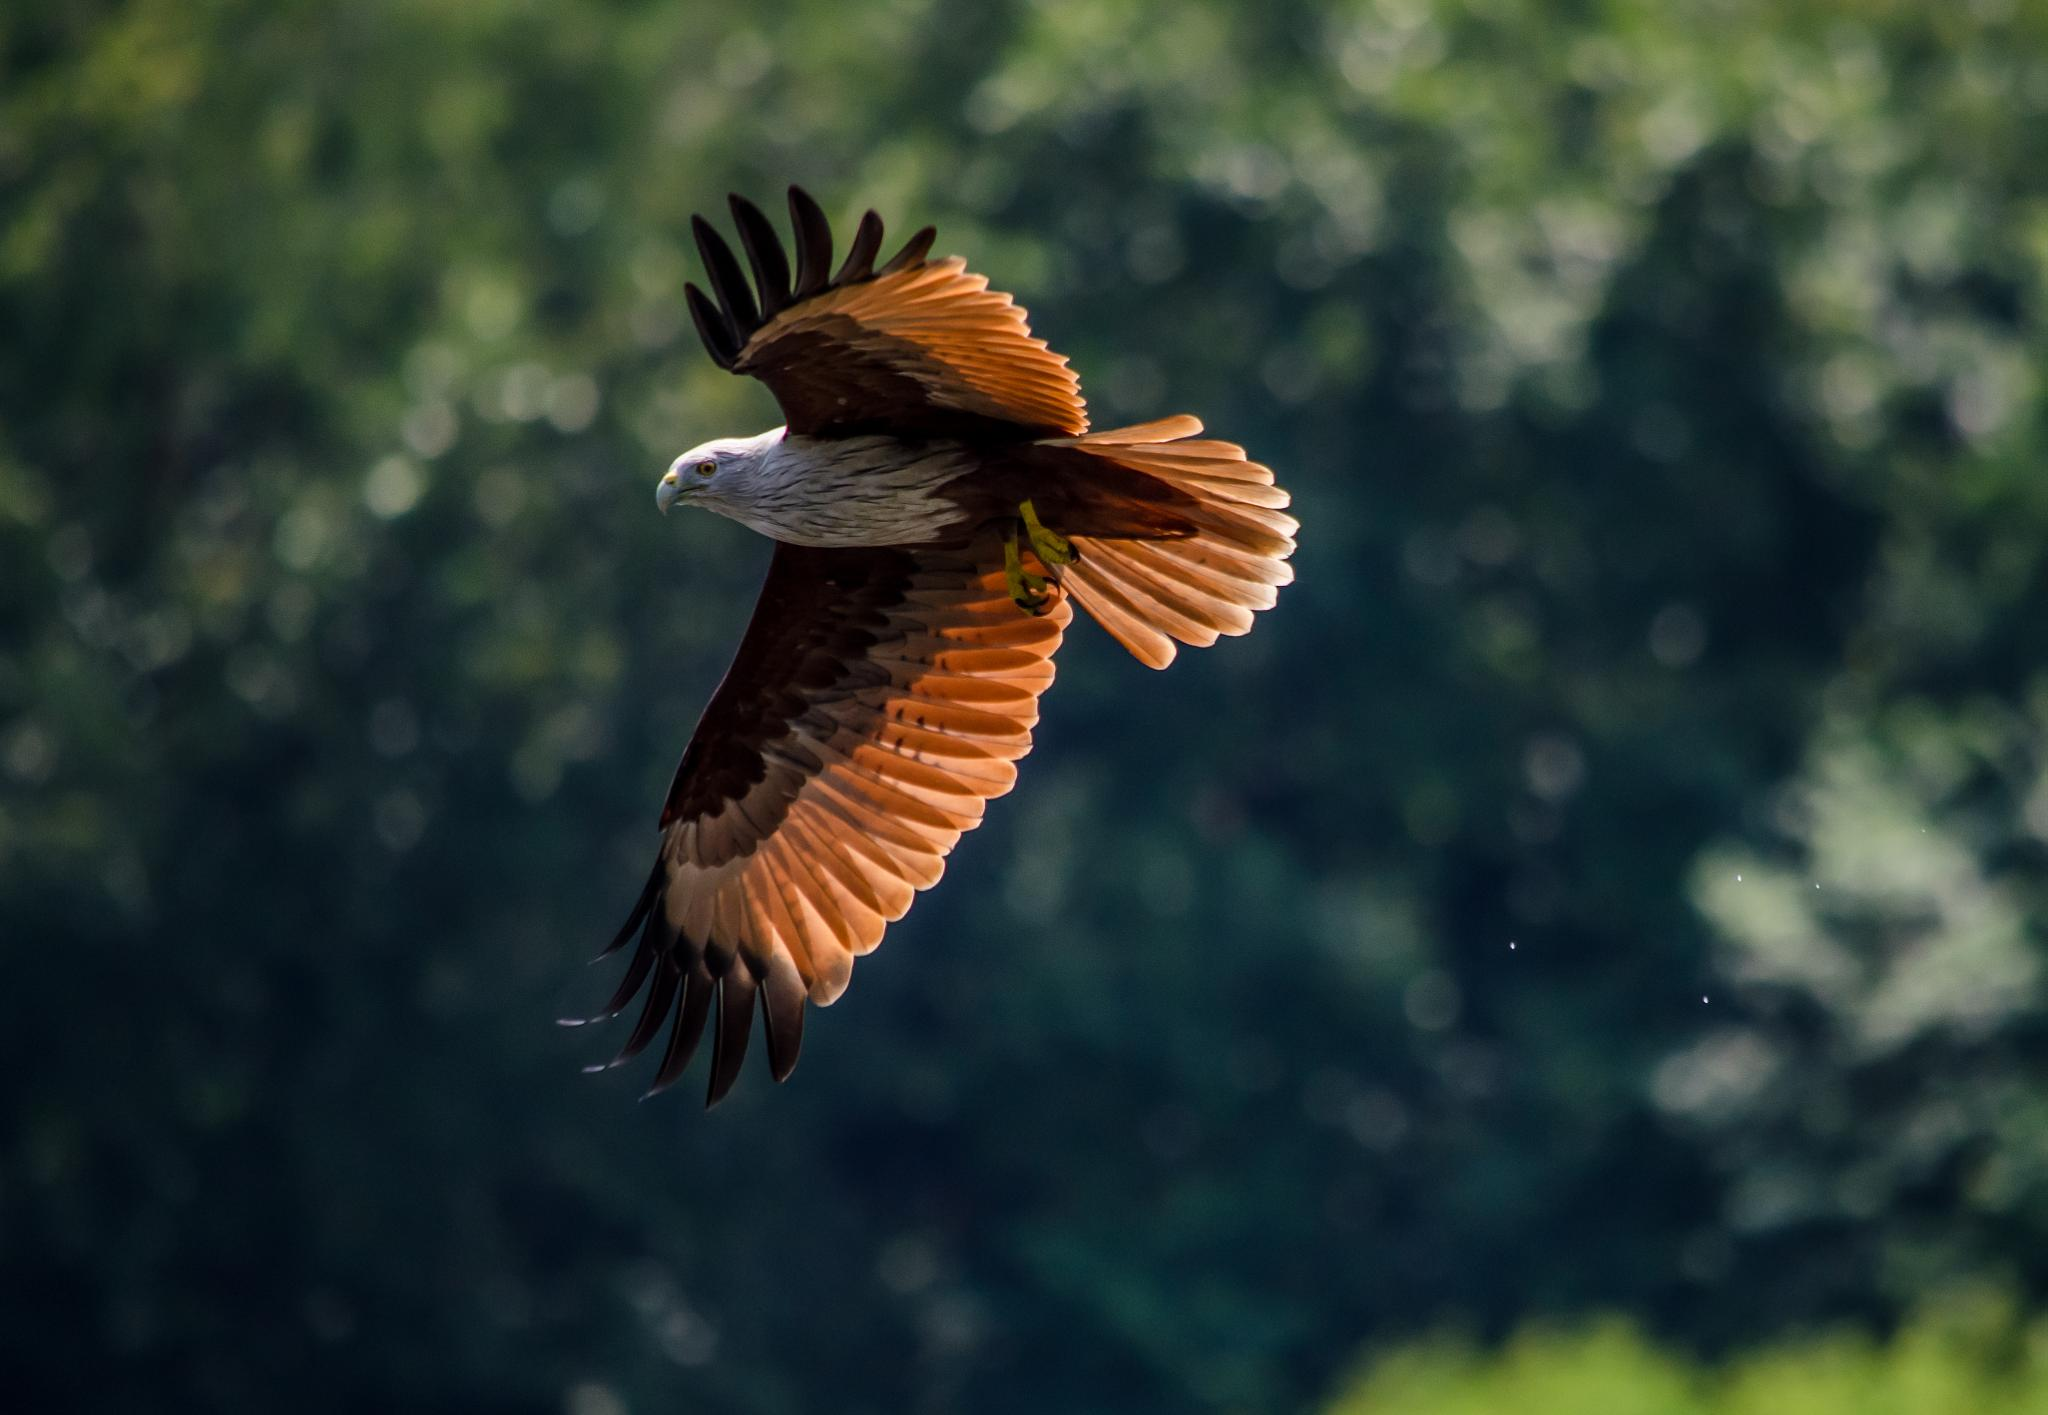 Brahminy kite  by Iqbal Sohel